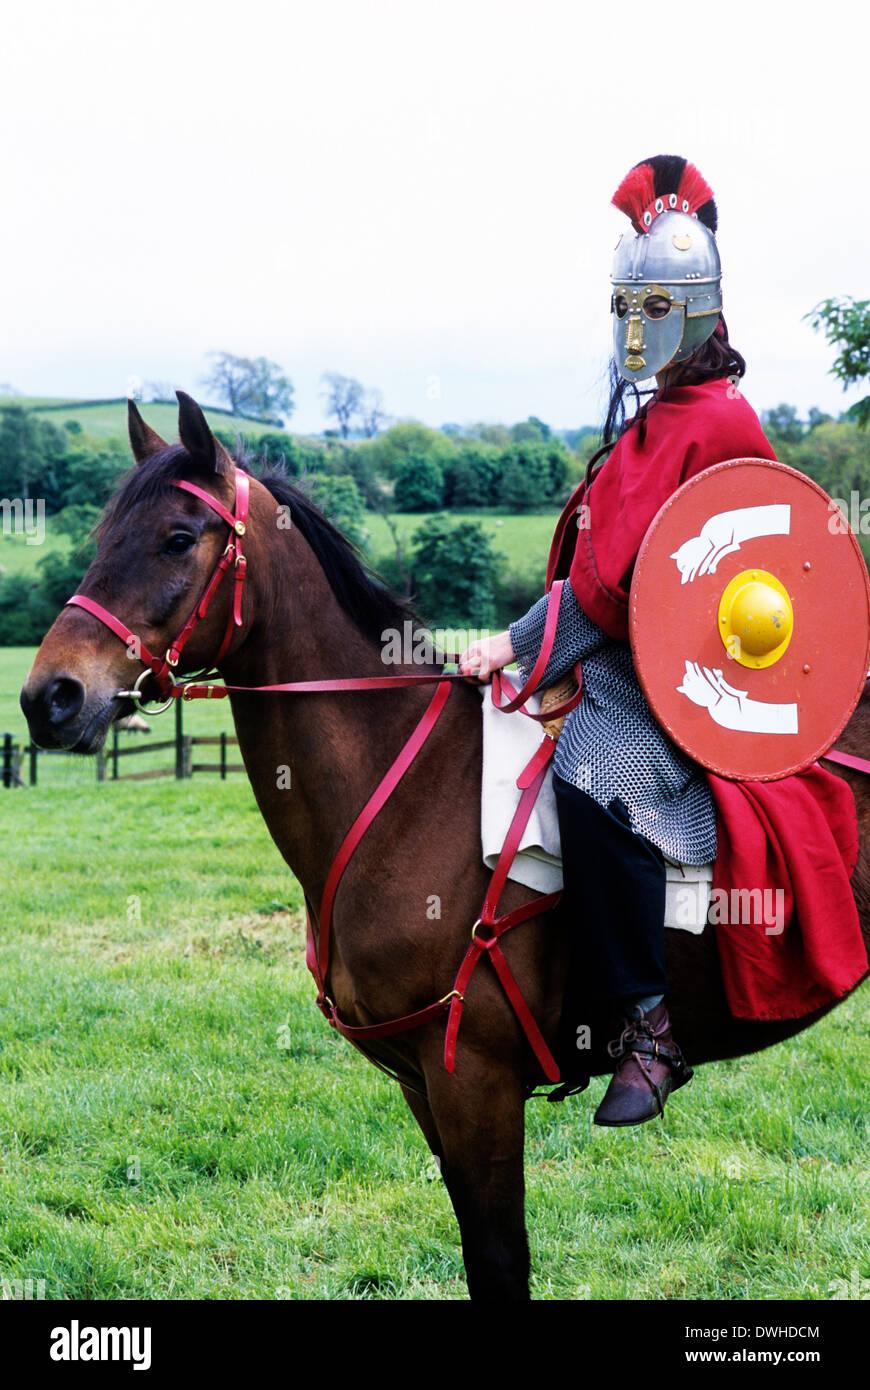 Romano British warrior soldier soldiers on horseback, cavalry 5th century, historical re-enactment England UK - Stock Image